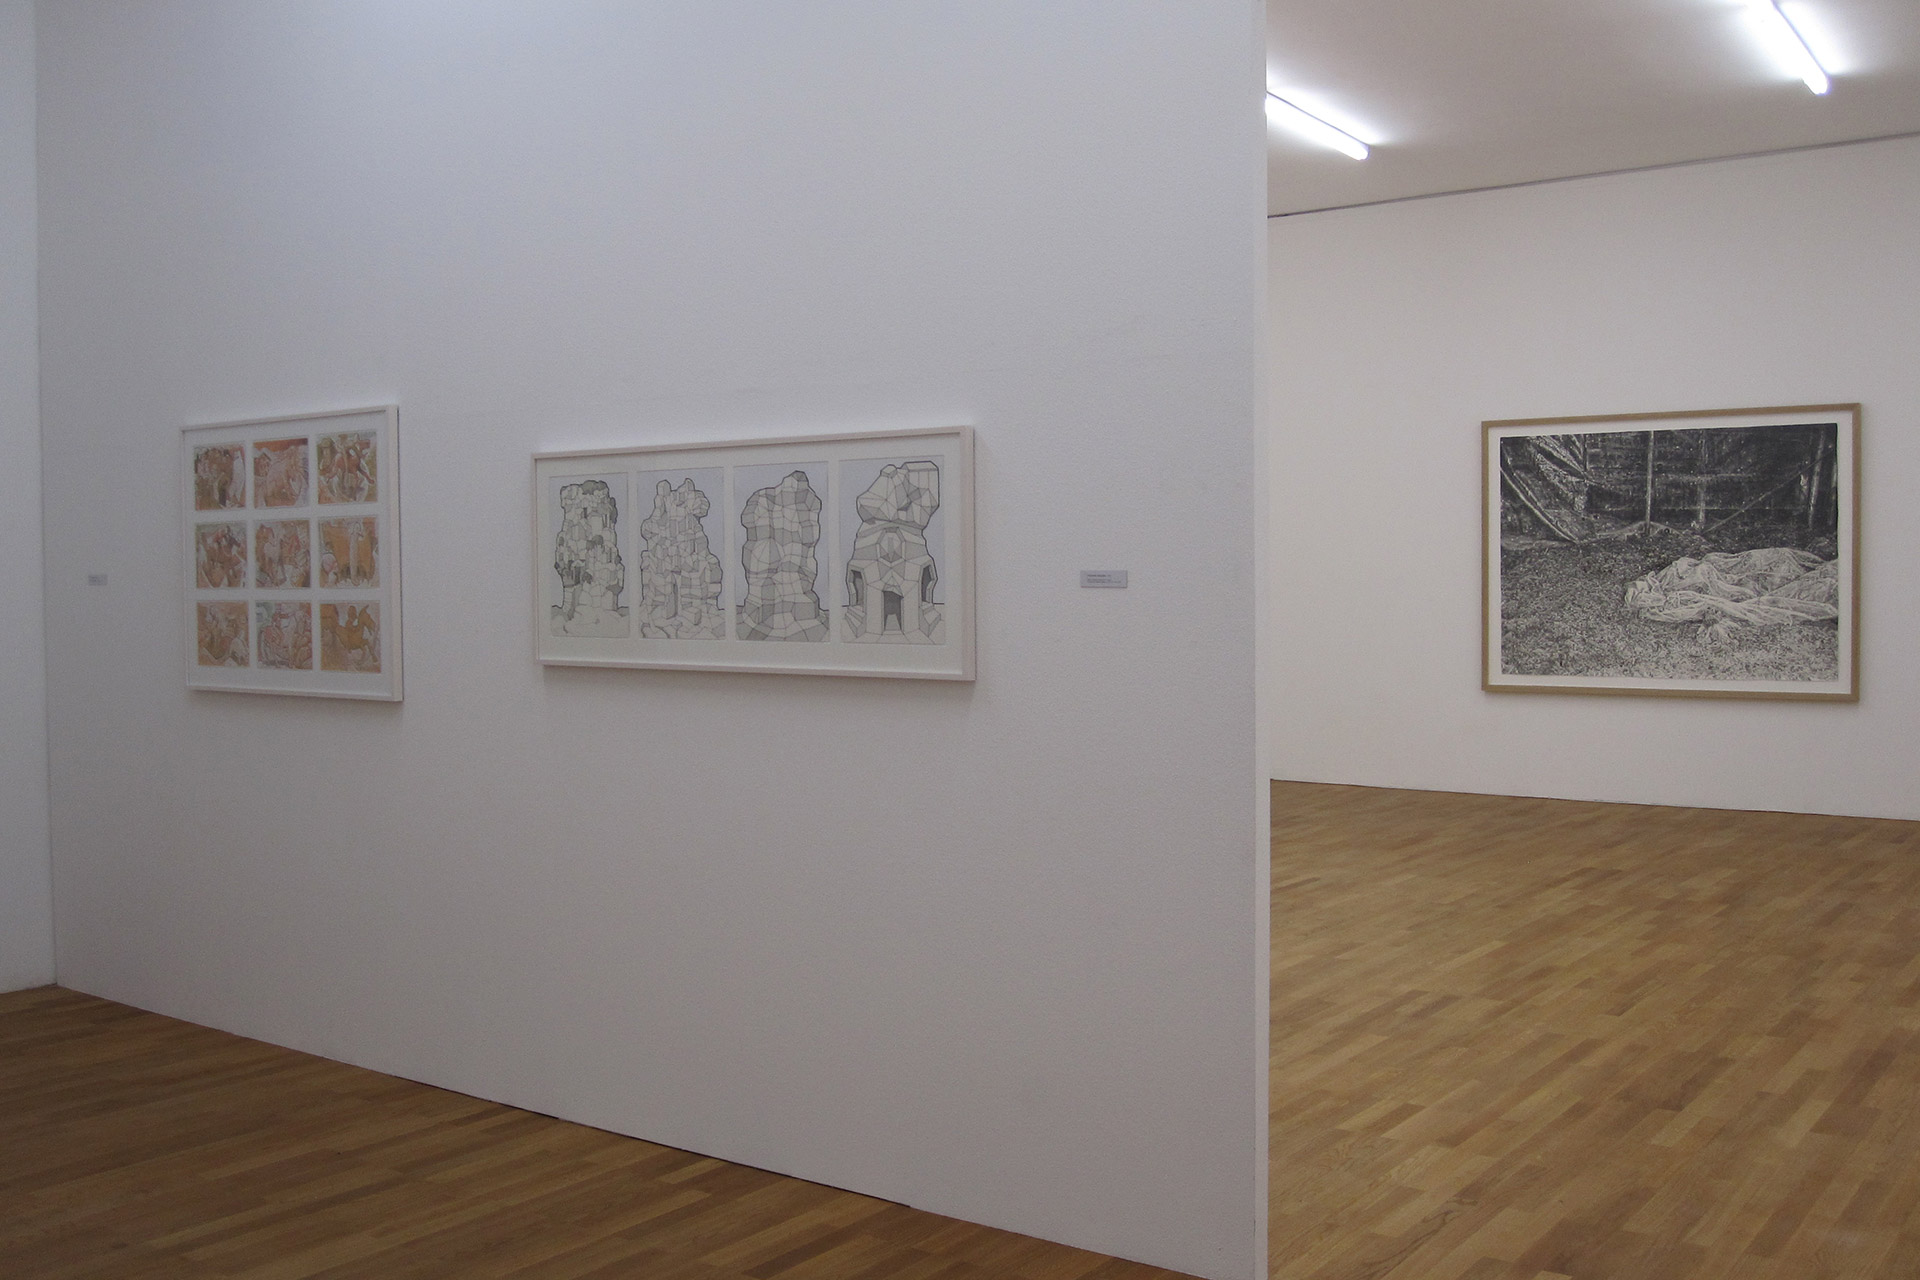 Dezember-Ausstellung-Kunsthalle-Winterthur-2010-3.jpg